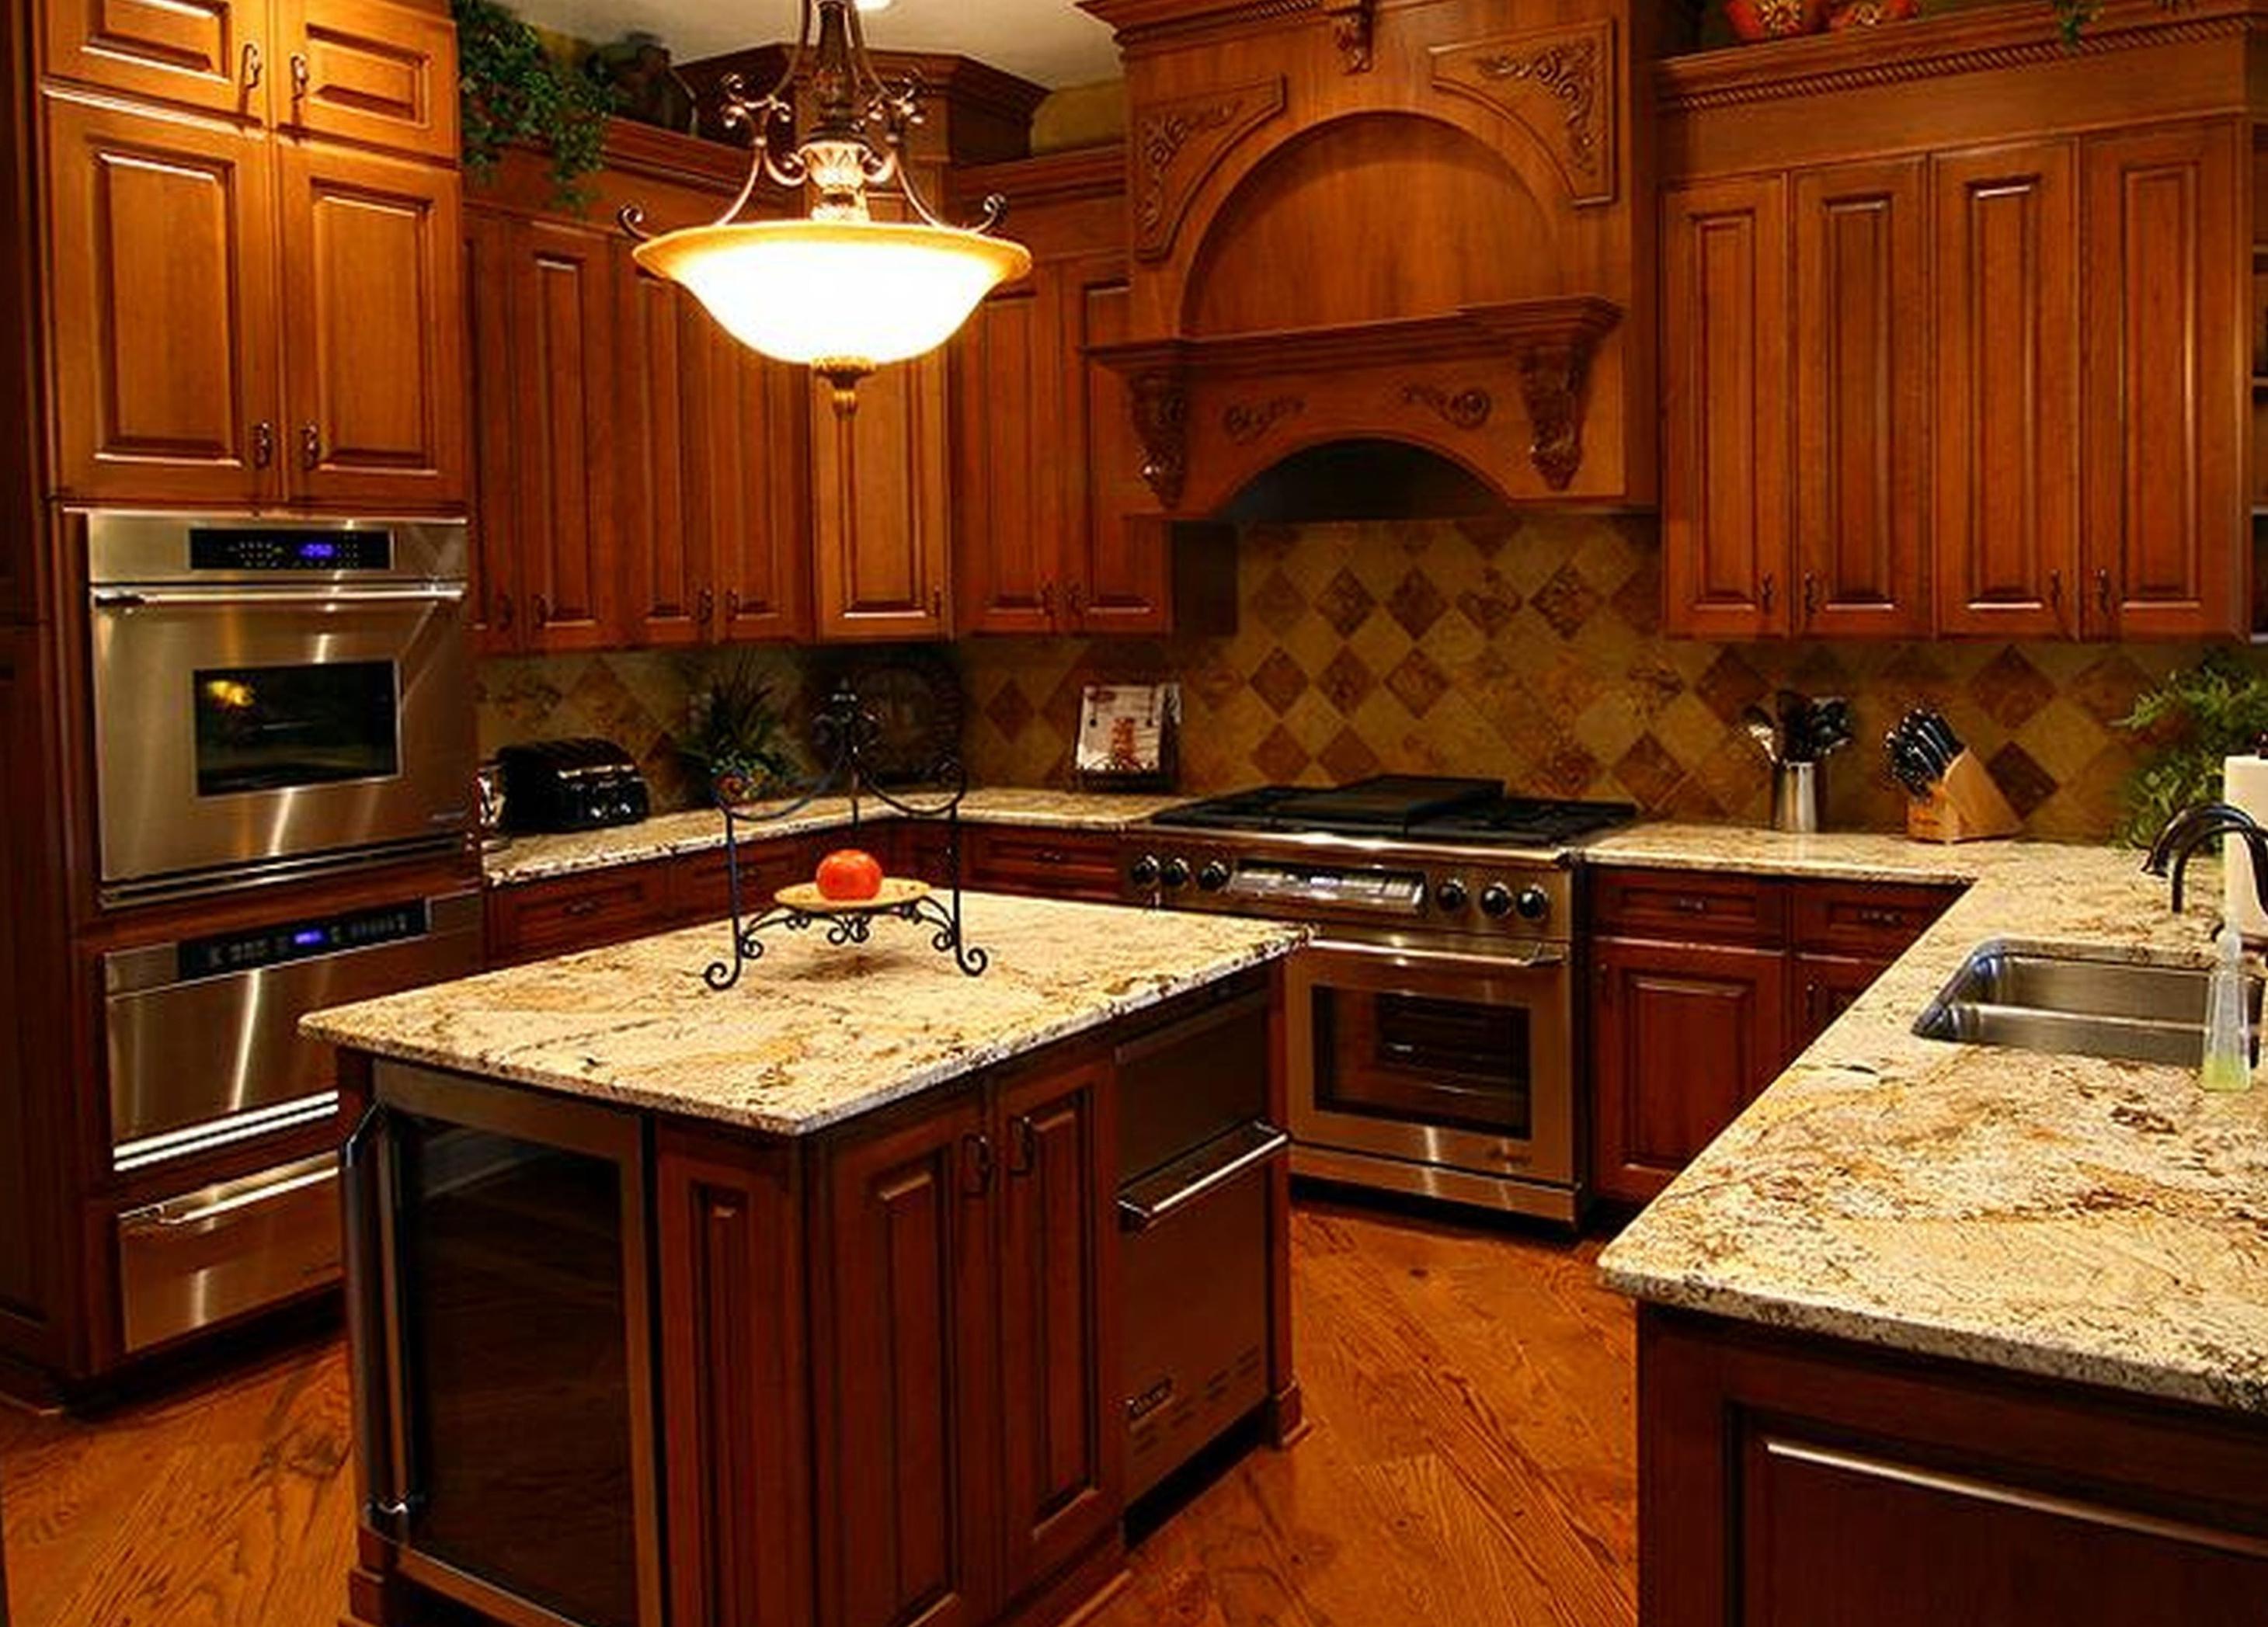 Cabinnova Kitchens Refacing